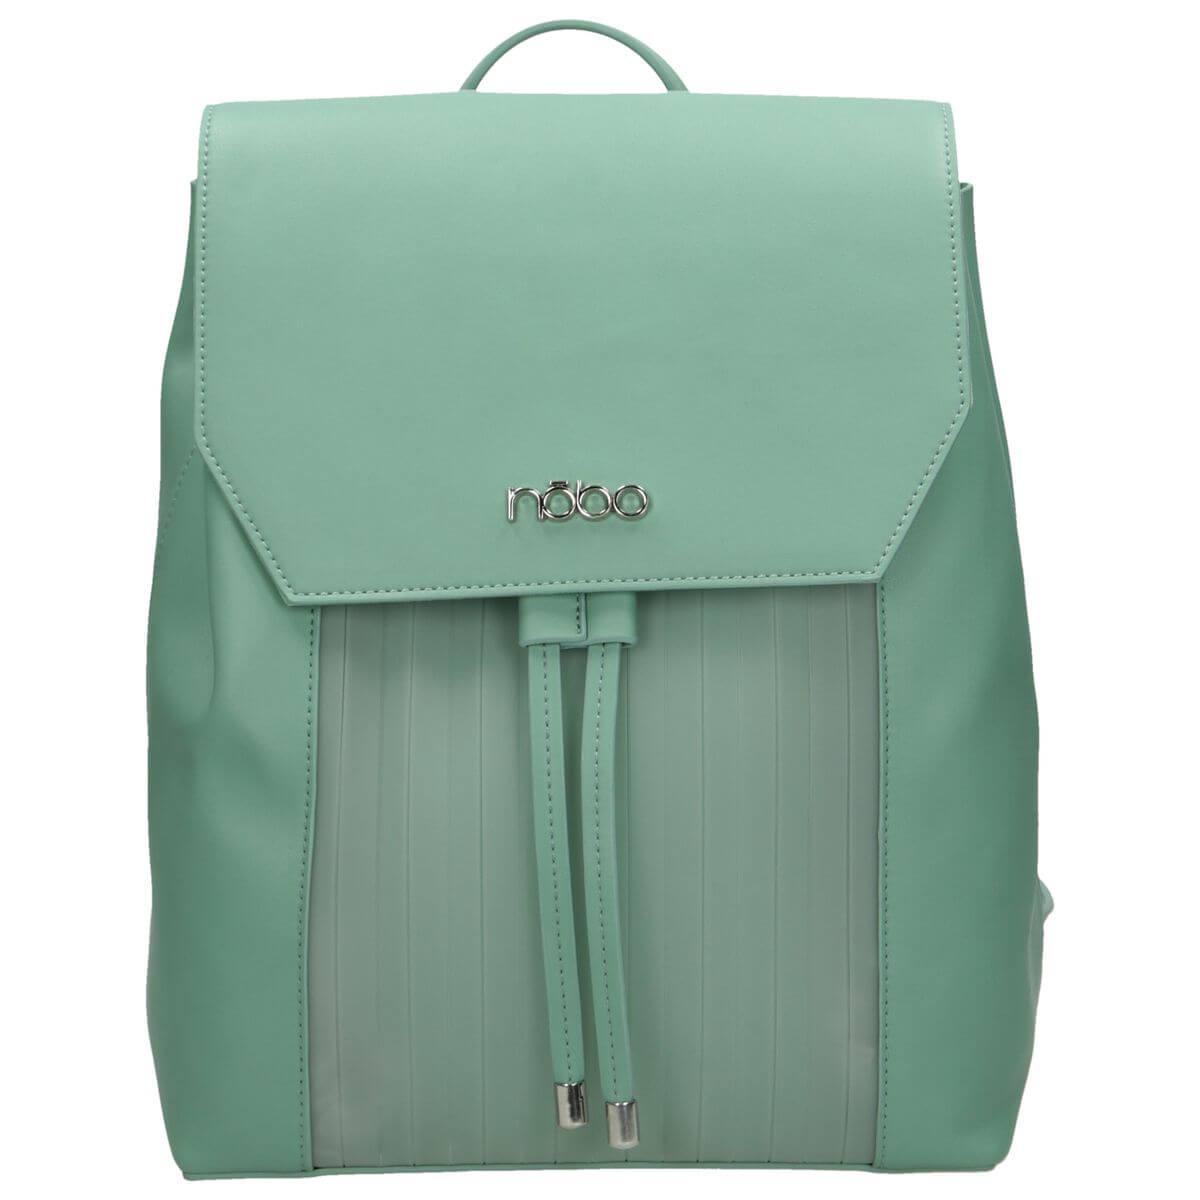 Nobo Woman's Backpack NBAG-I1100-C008